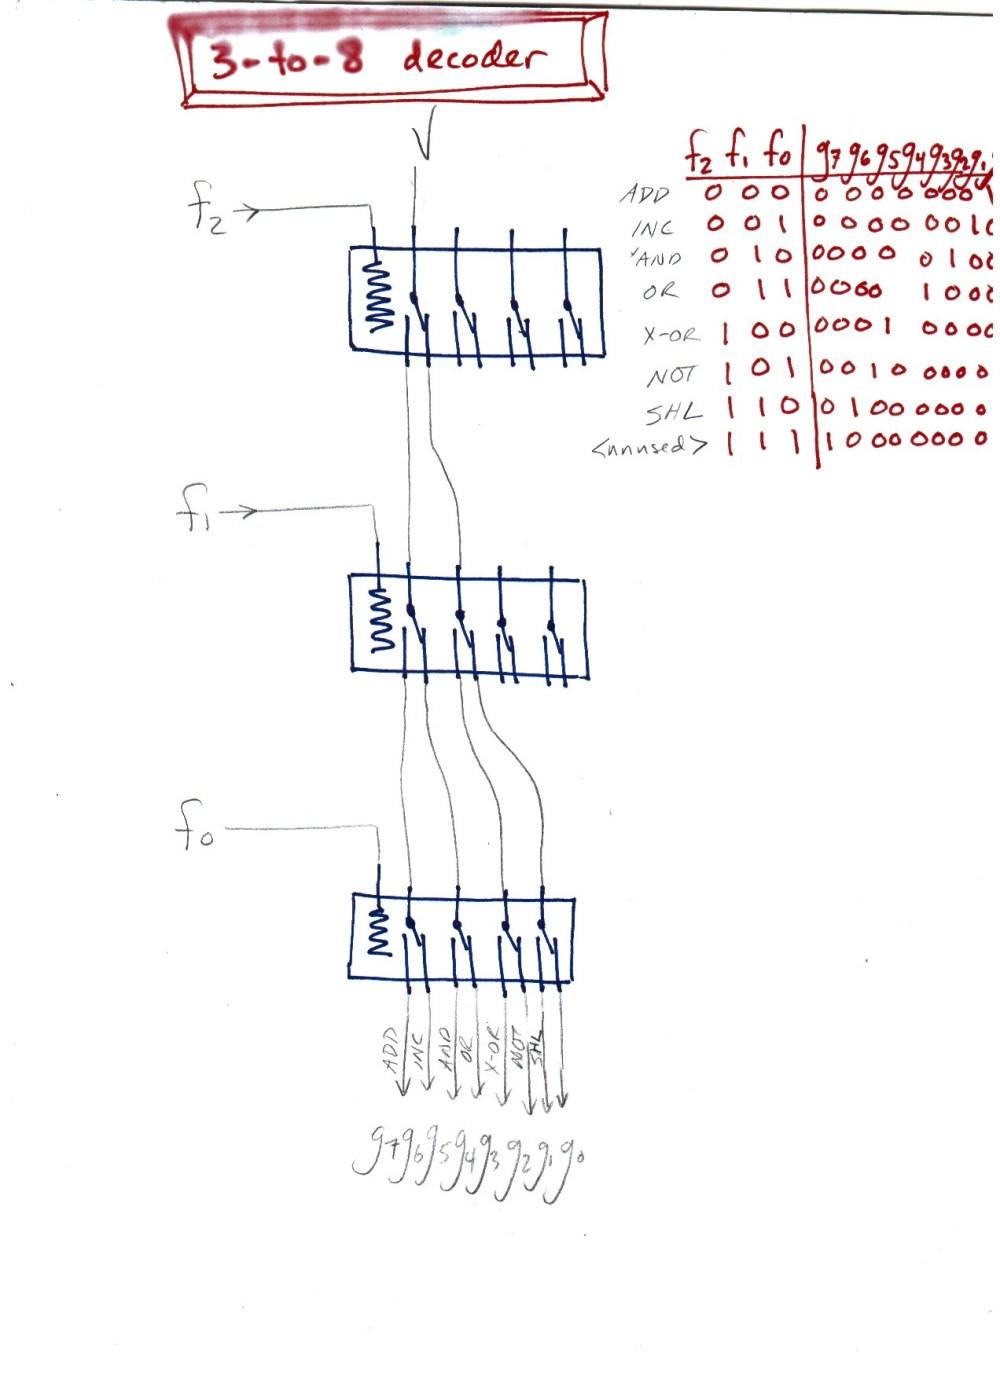 medium resolution of 3 to 8 decoder 1